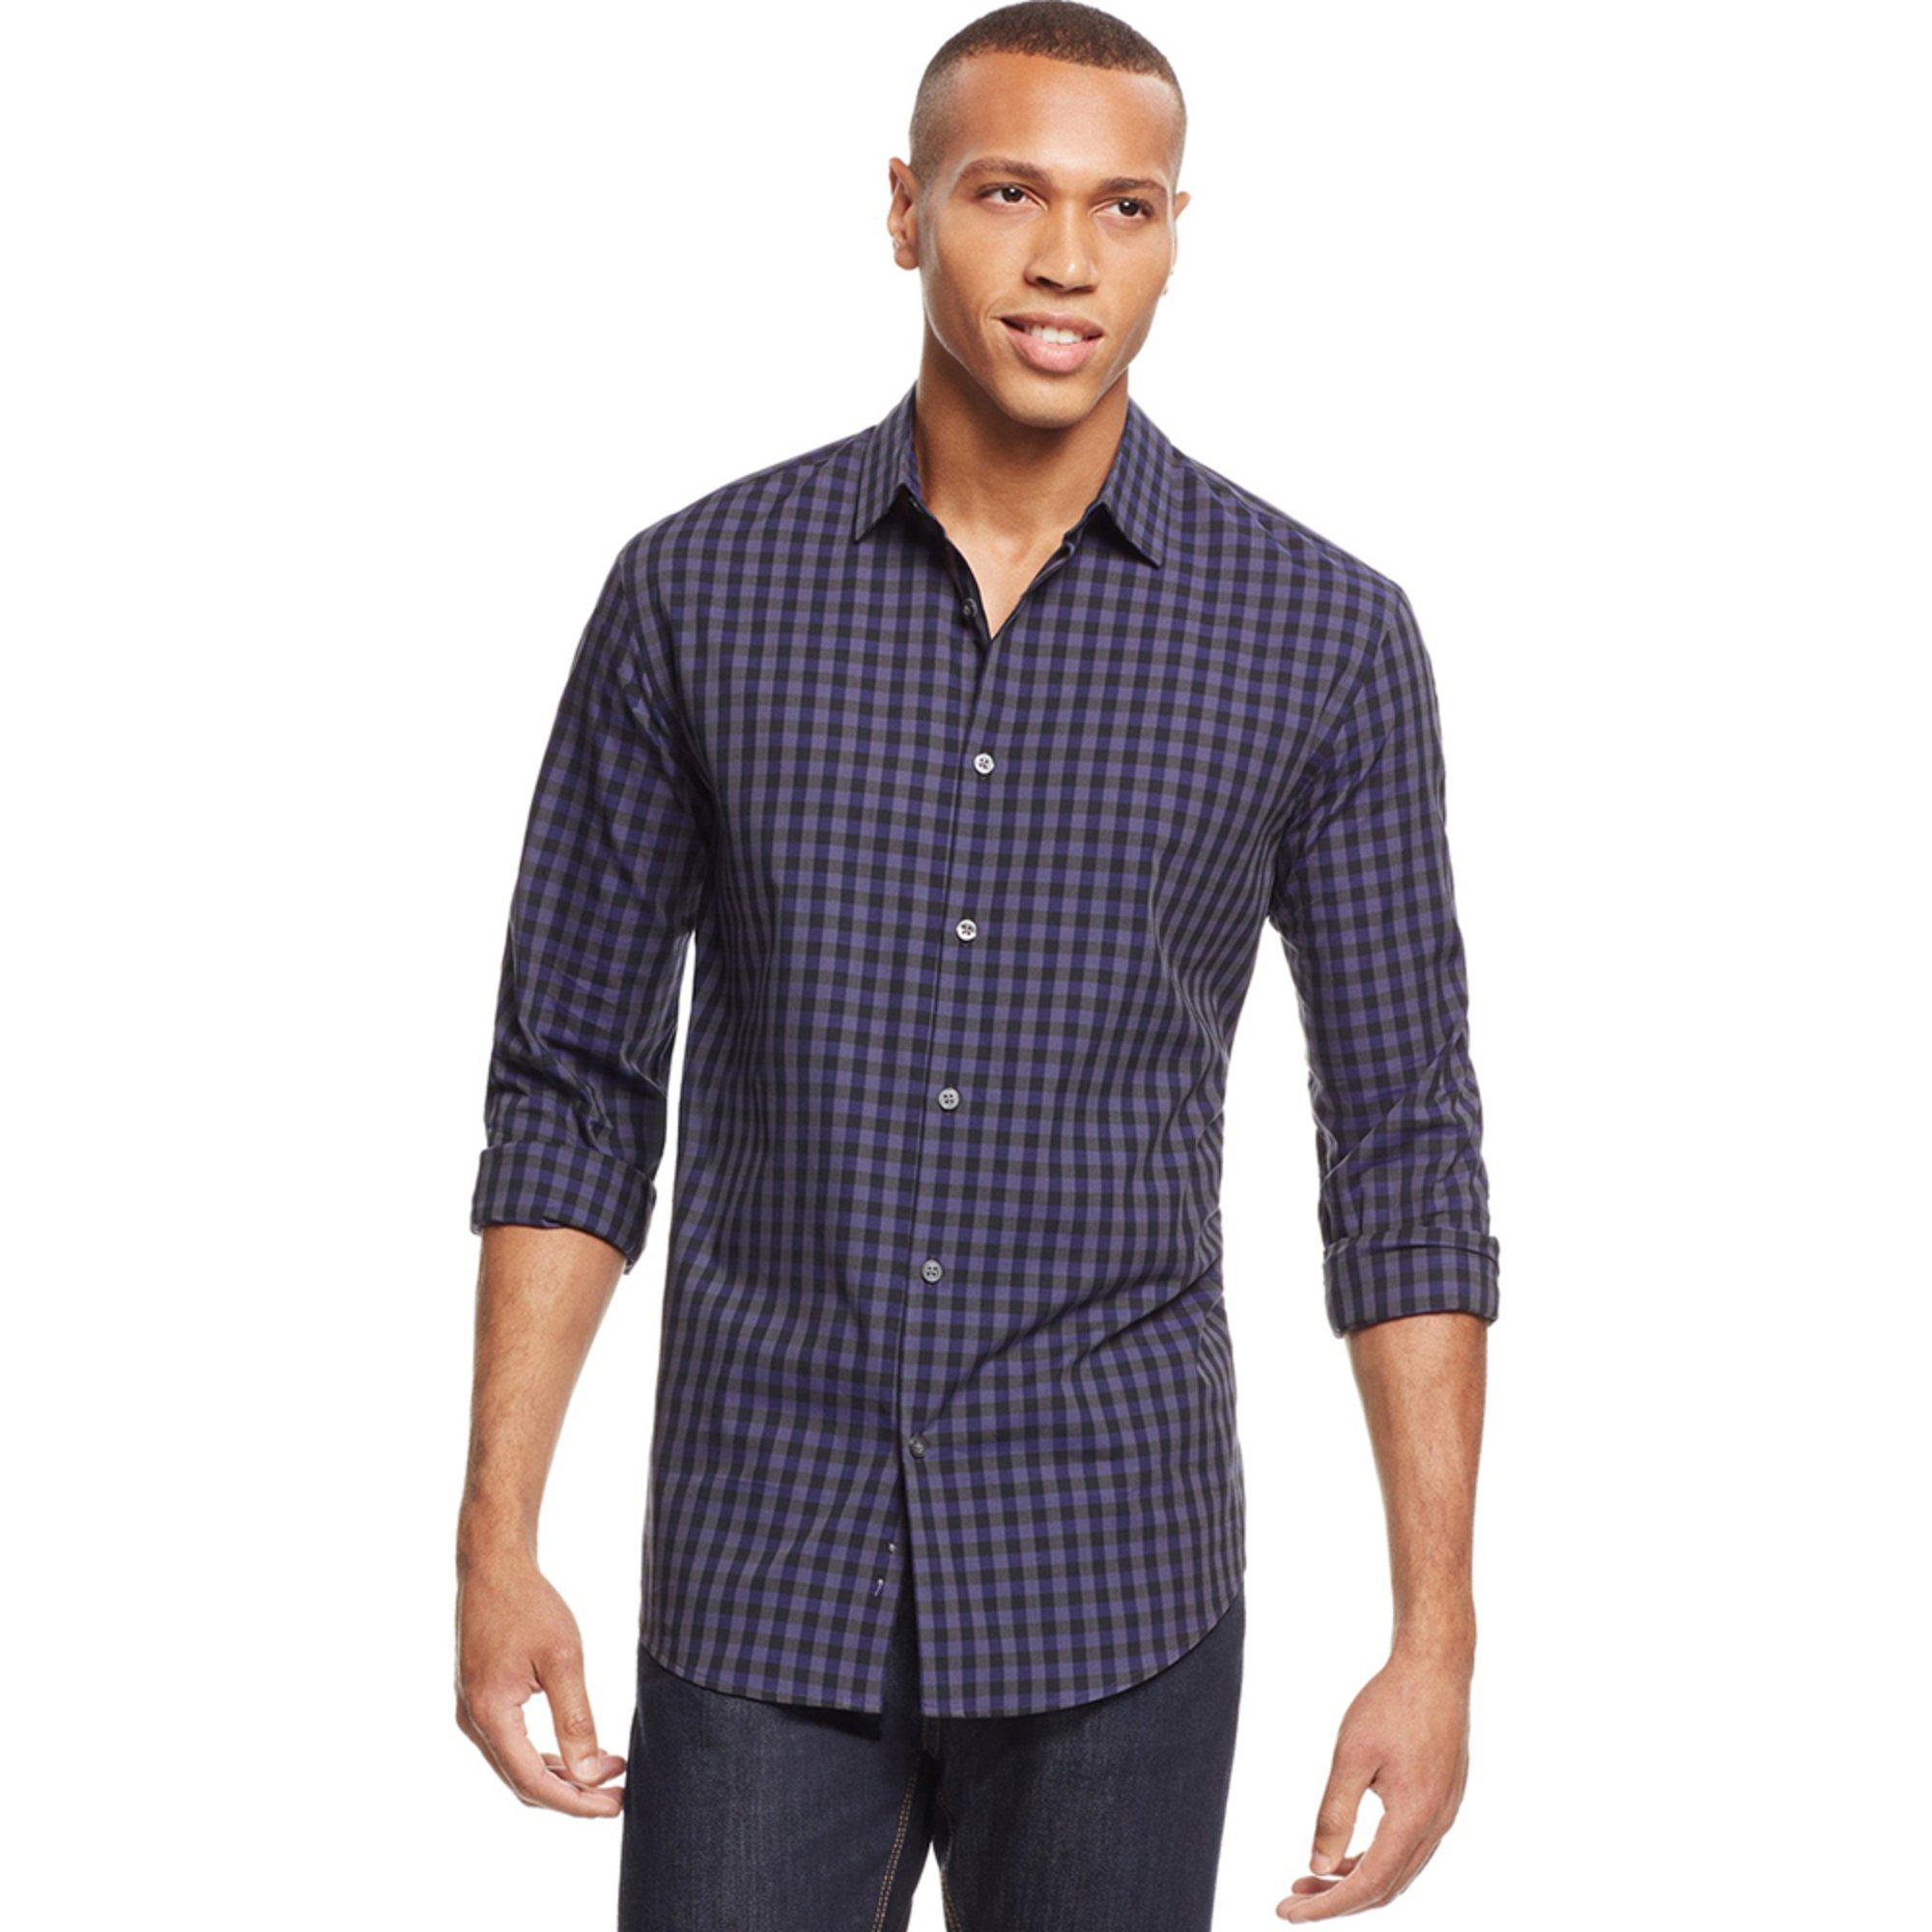 alfani s gingham sport shirt s clothing